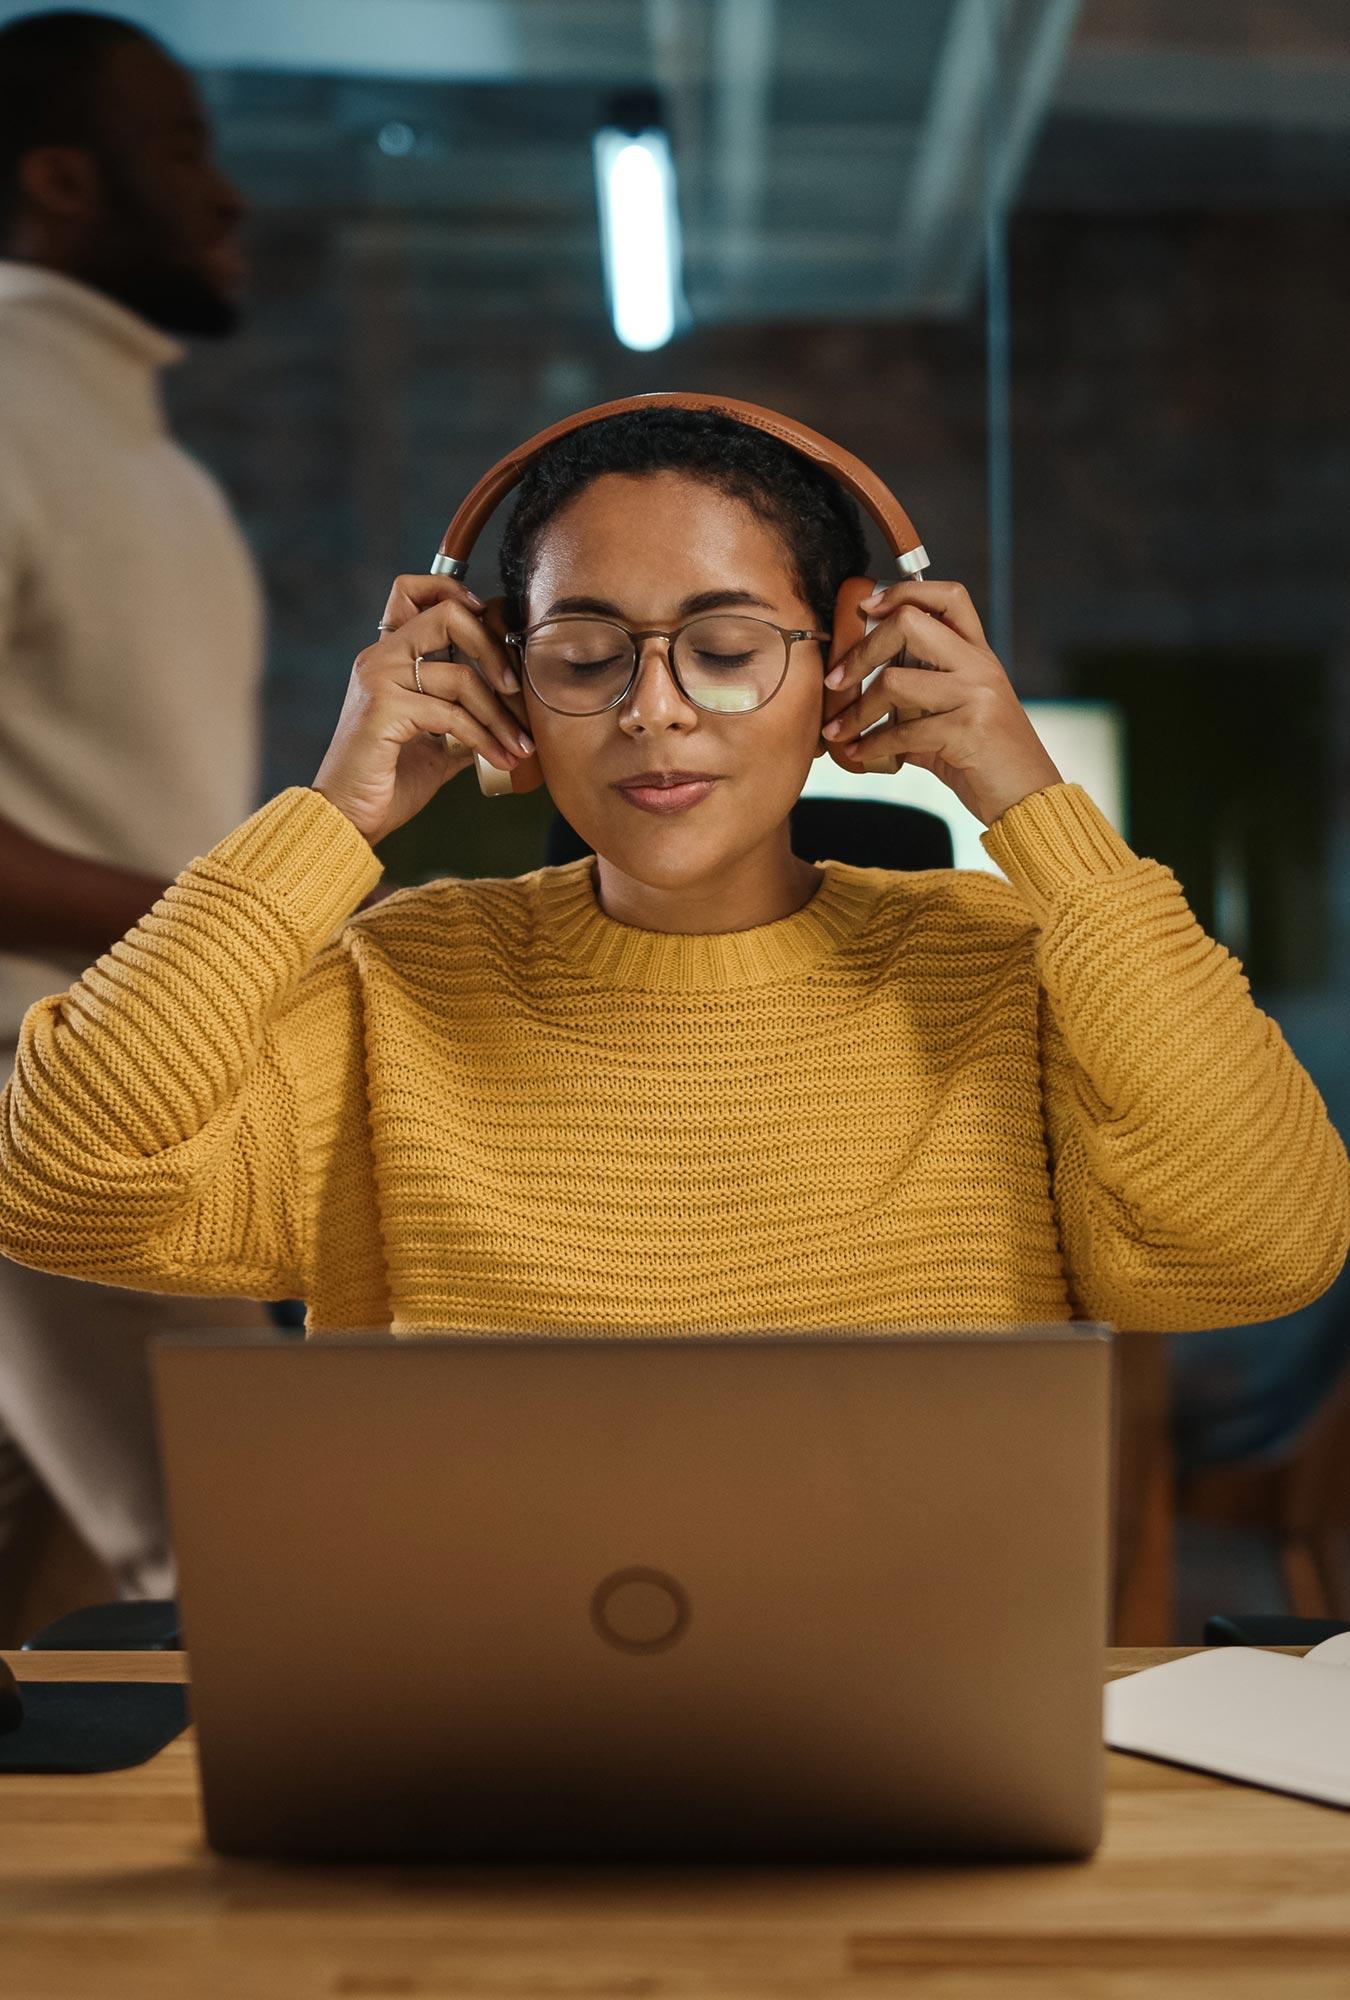 Woman with headphones experiencing immersive audio